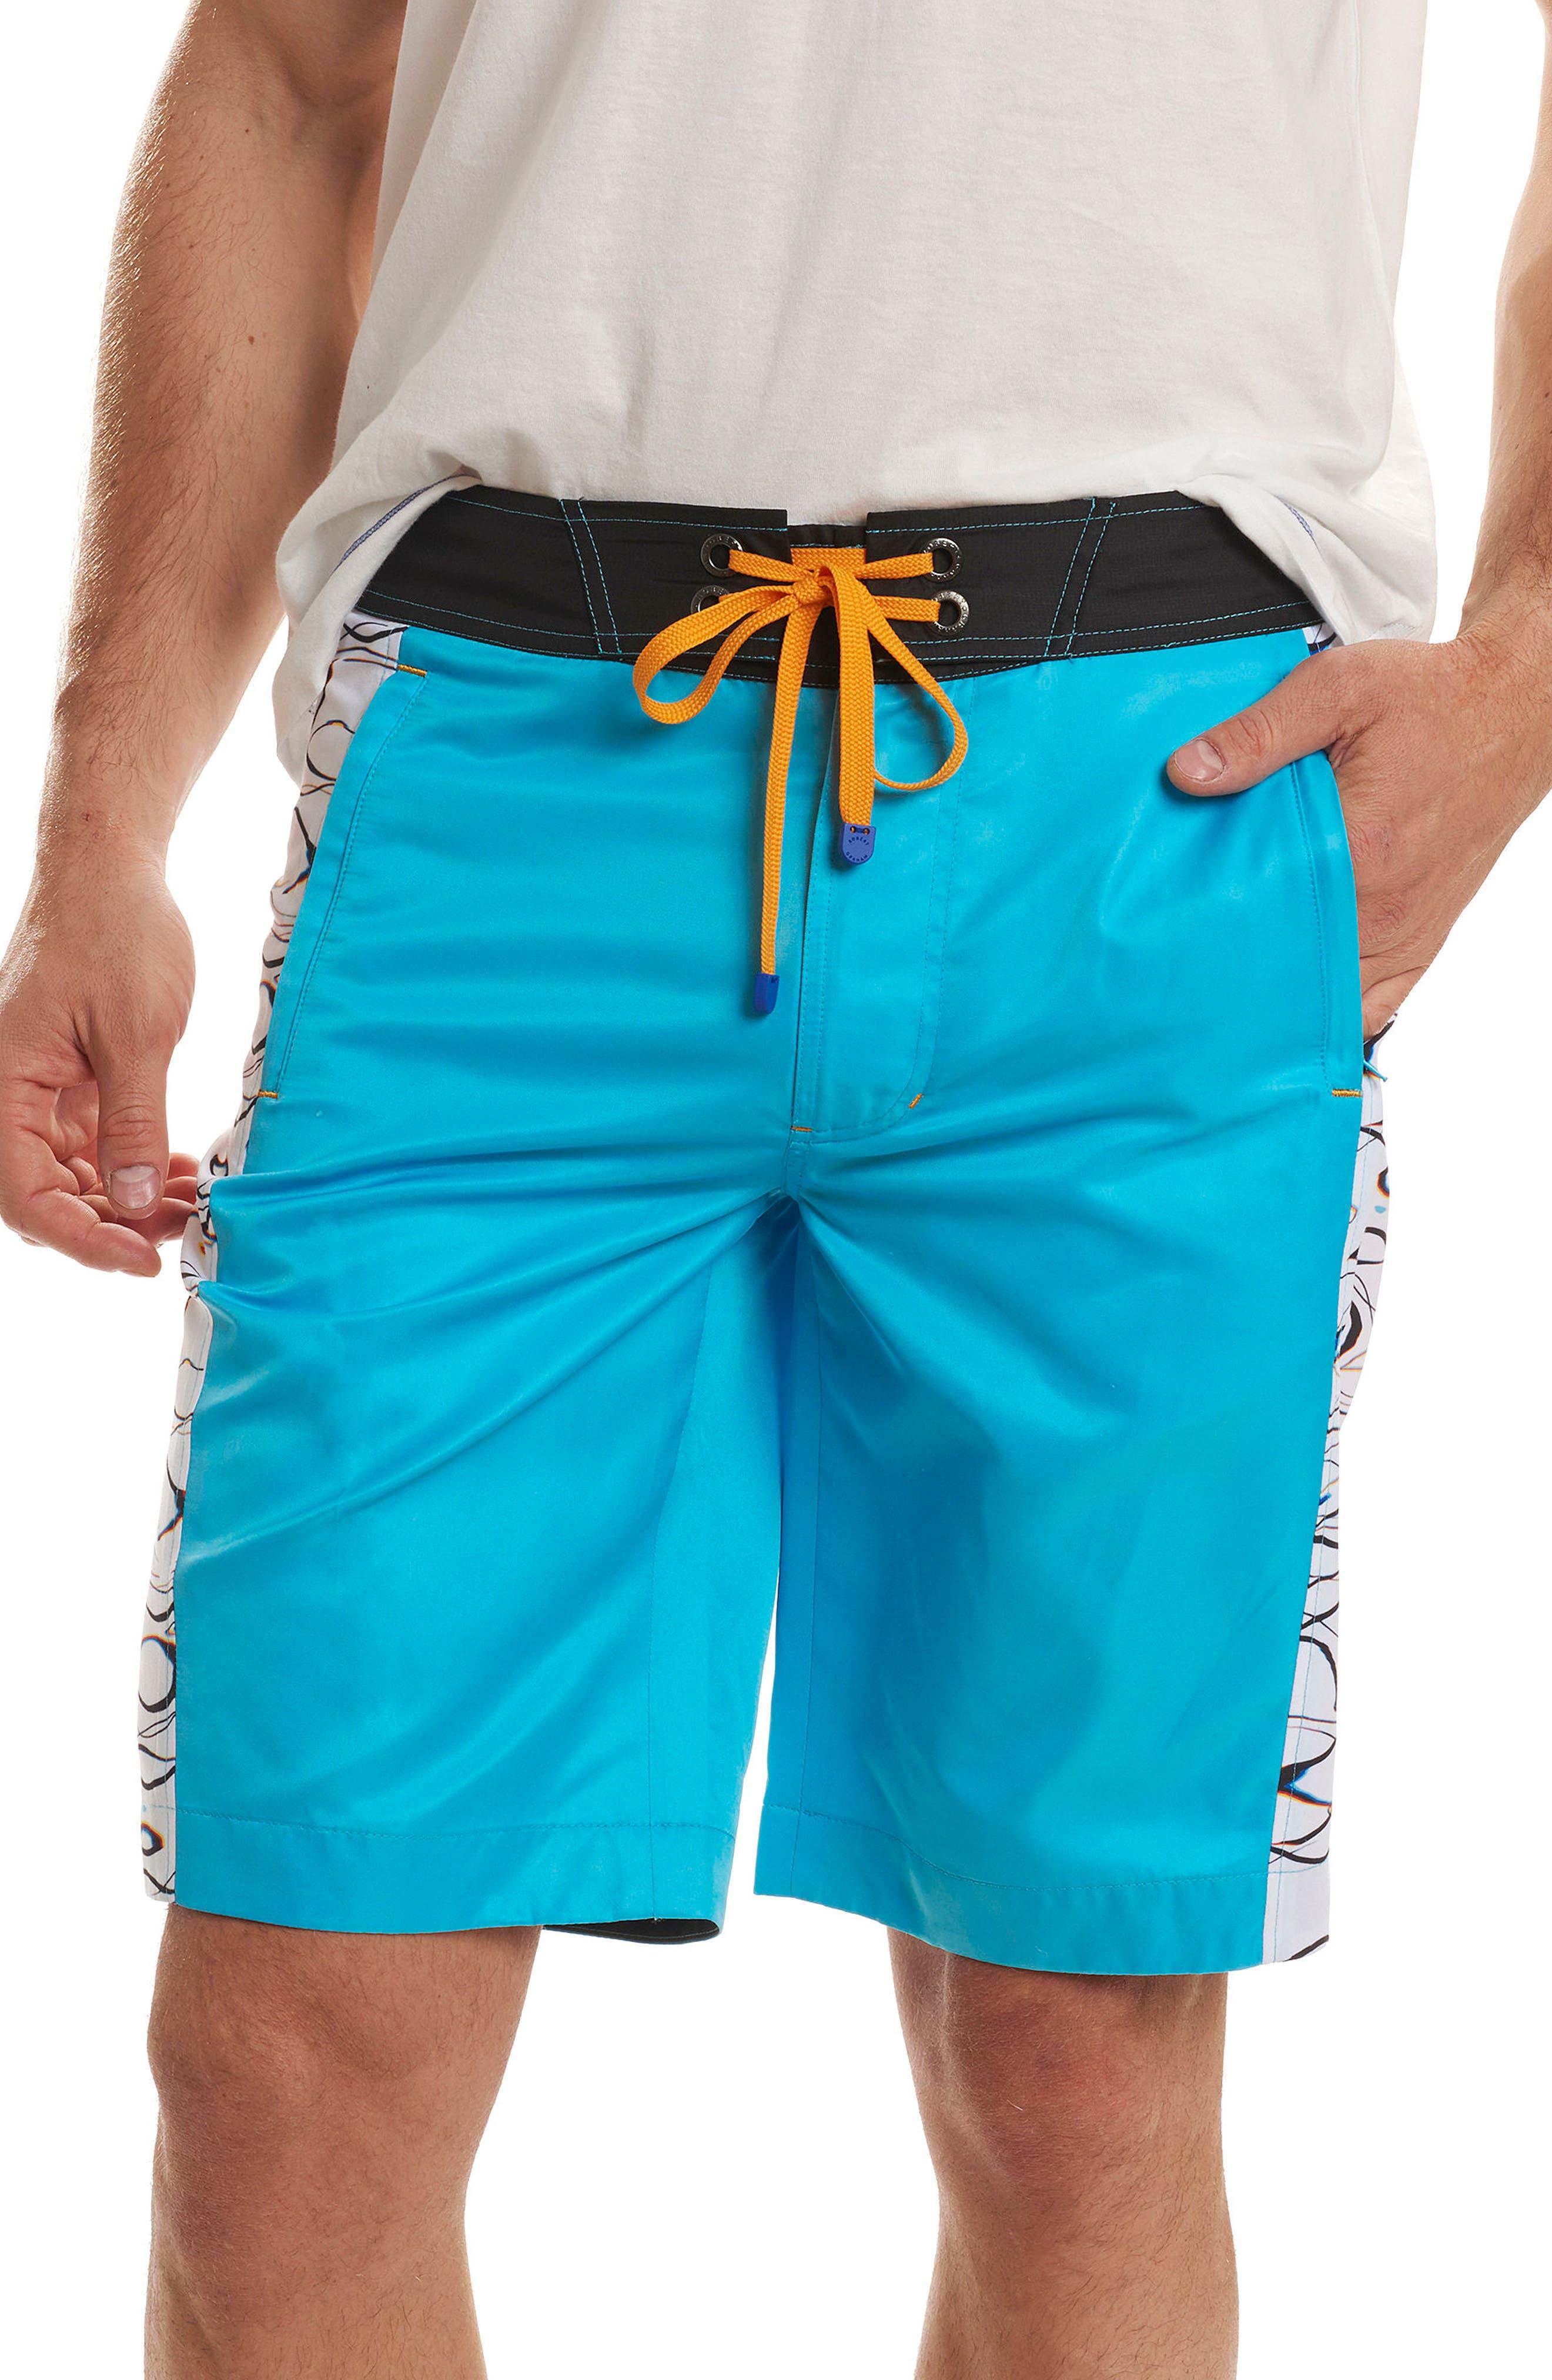 Maili Classic Fit Swim Trunks,                             Main thumbnail 1, color,                             459